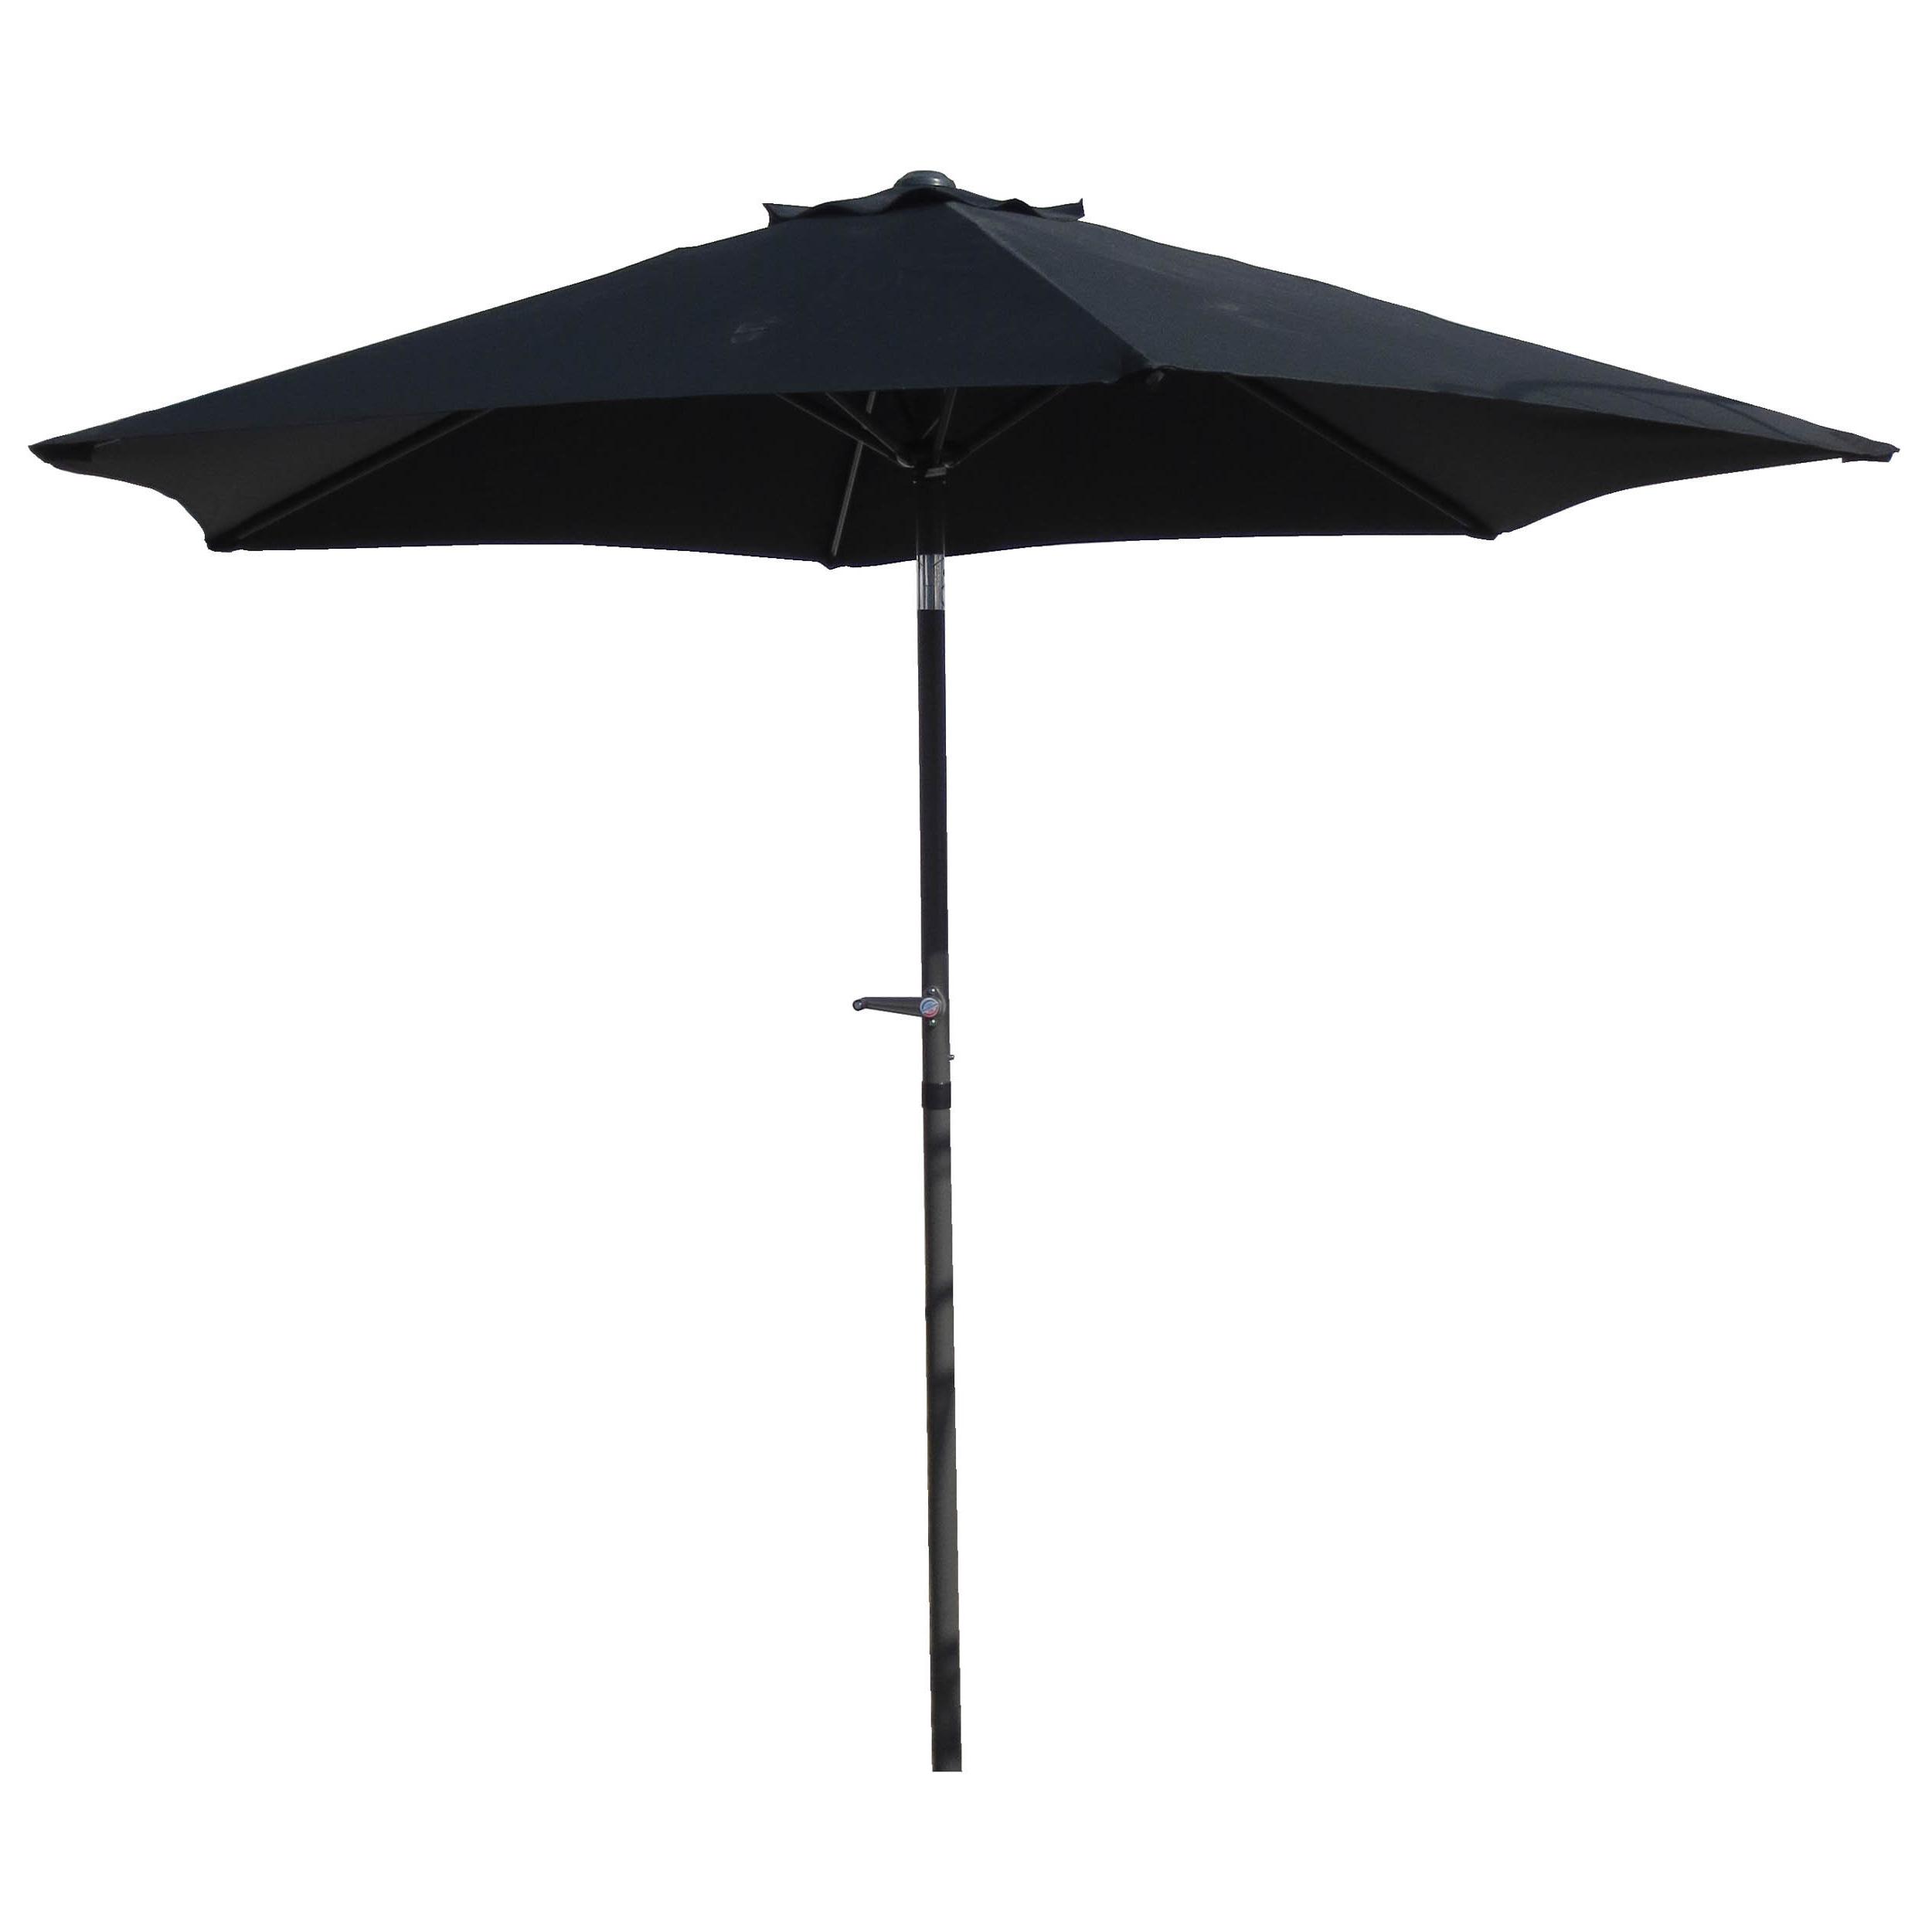 Brayden Studio Hyperion 8.5' Market Umbrella Intended For Latest Devansh Market Umbrellas (Gallery 13 of 20)